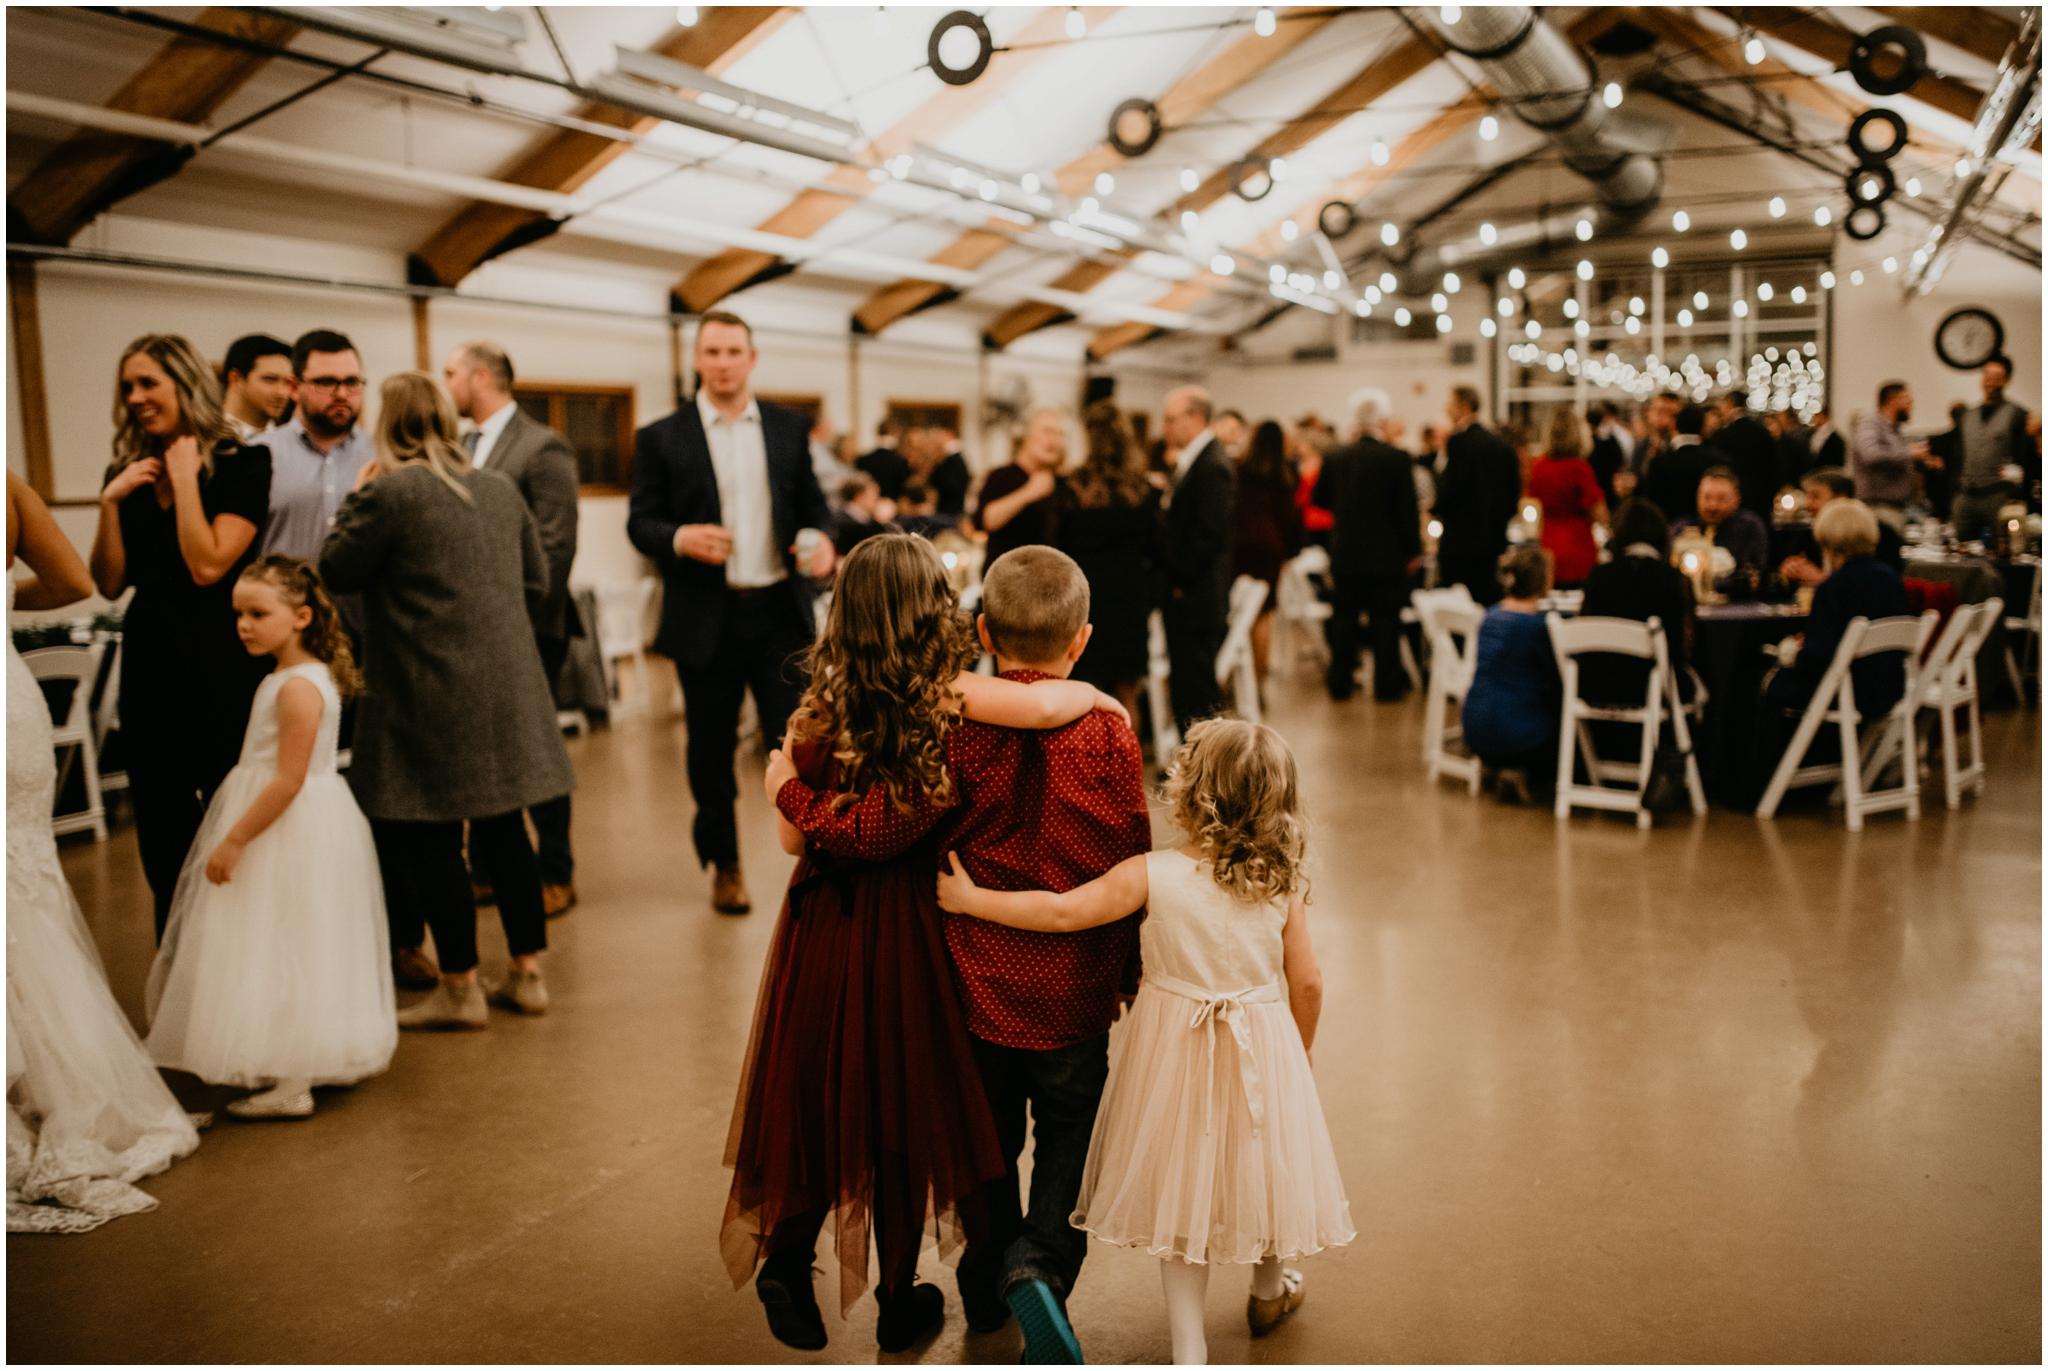 ashley-tj-the-pickering-barn-winter-wedding-seattle-photographer-070.jpg